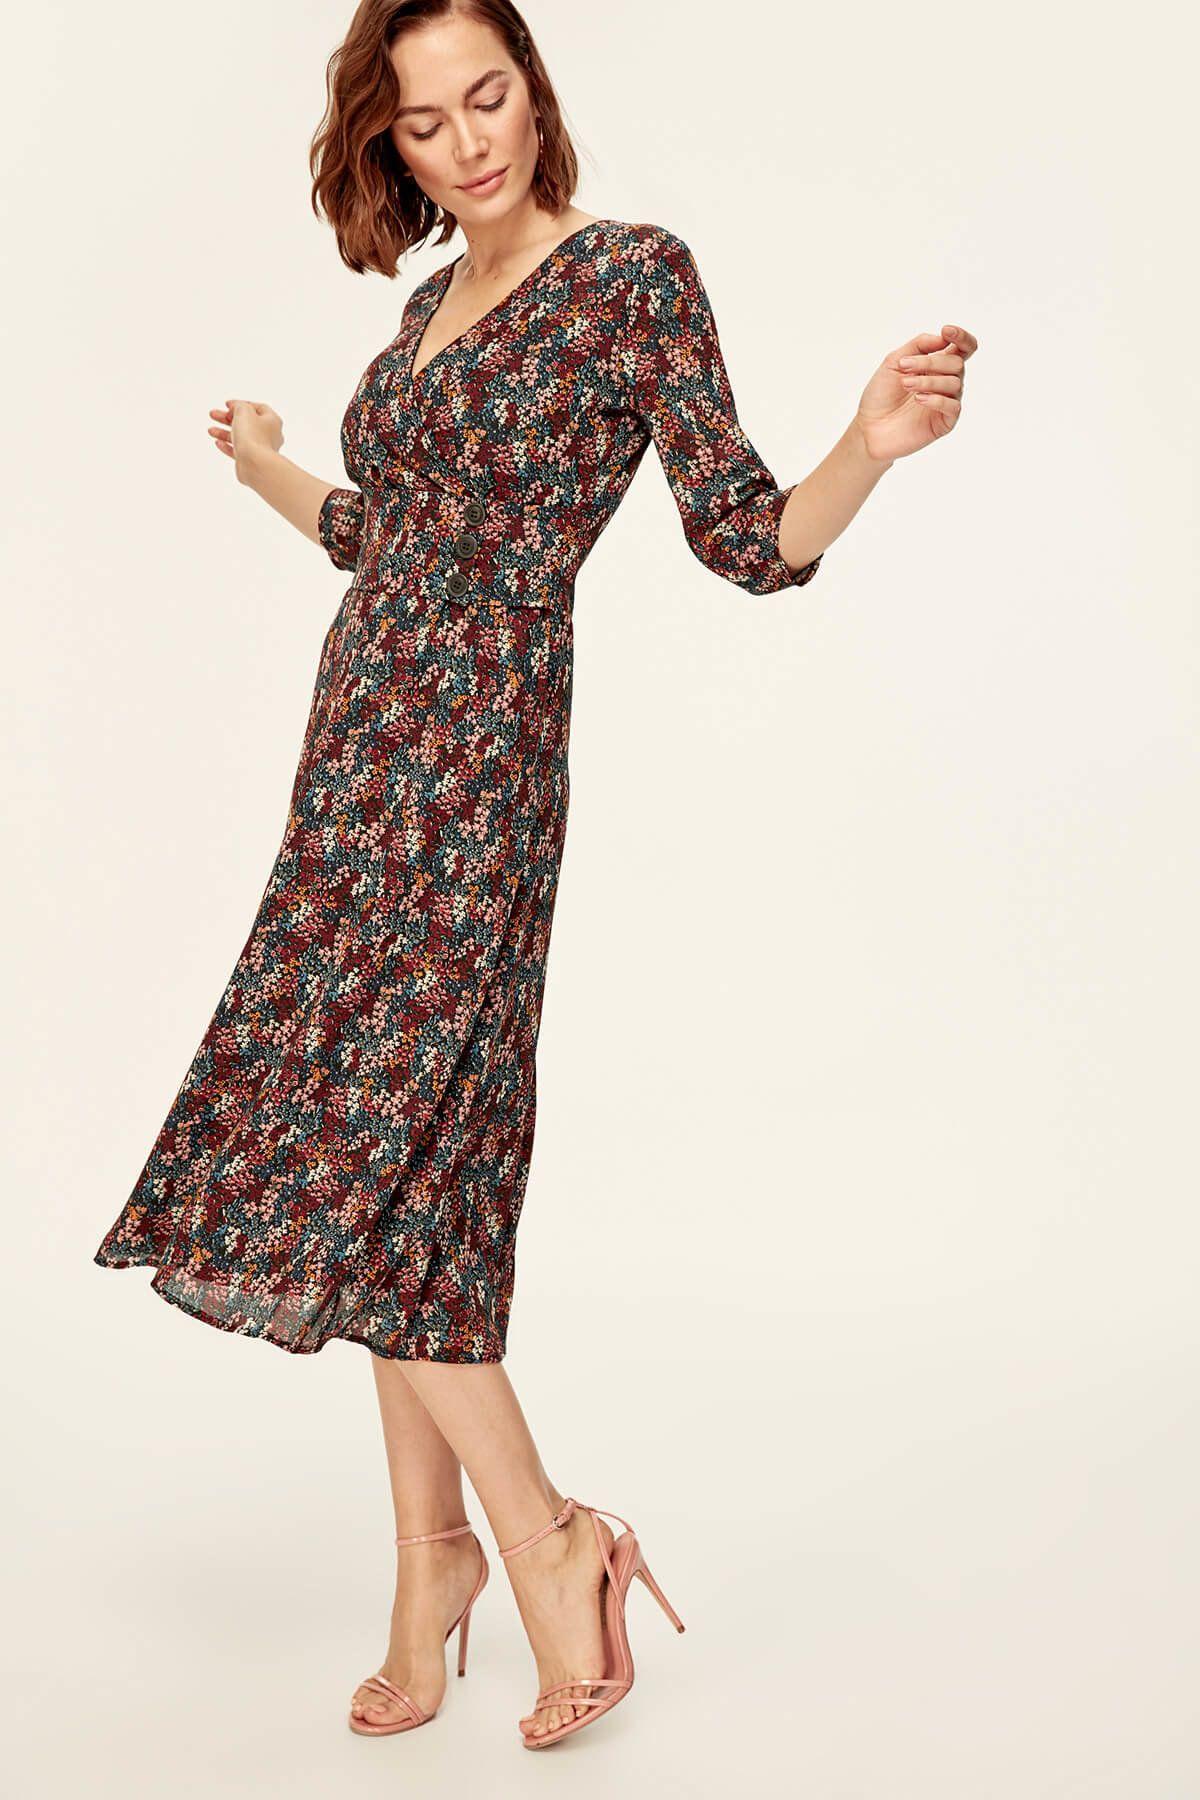 Cok Renkli Kusak Detayli Elbise Tofaw19yn0237 Trendyolmilla Trendyol Elbise